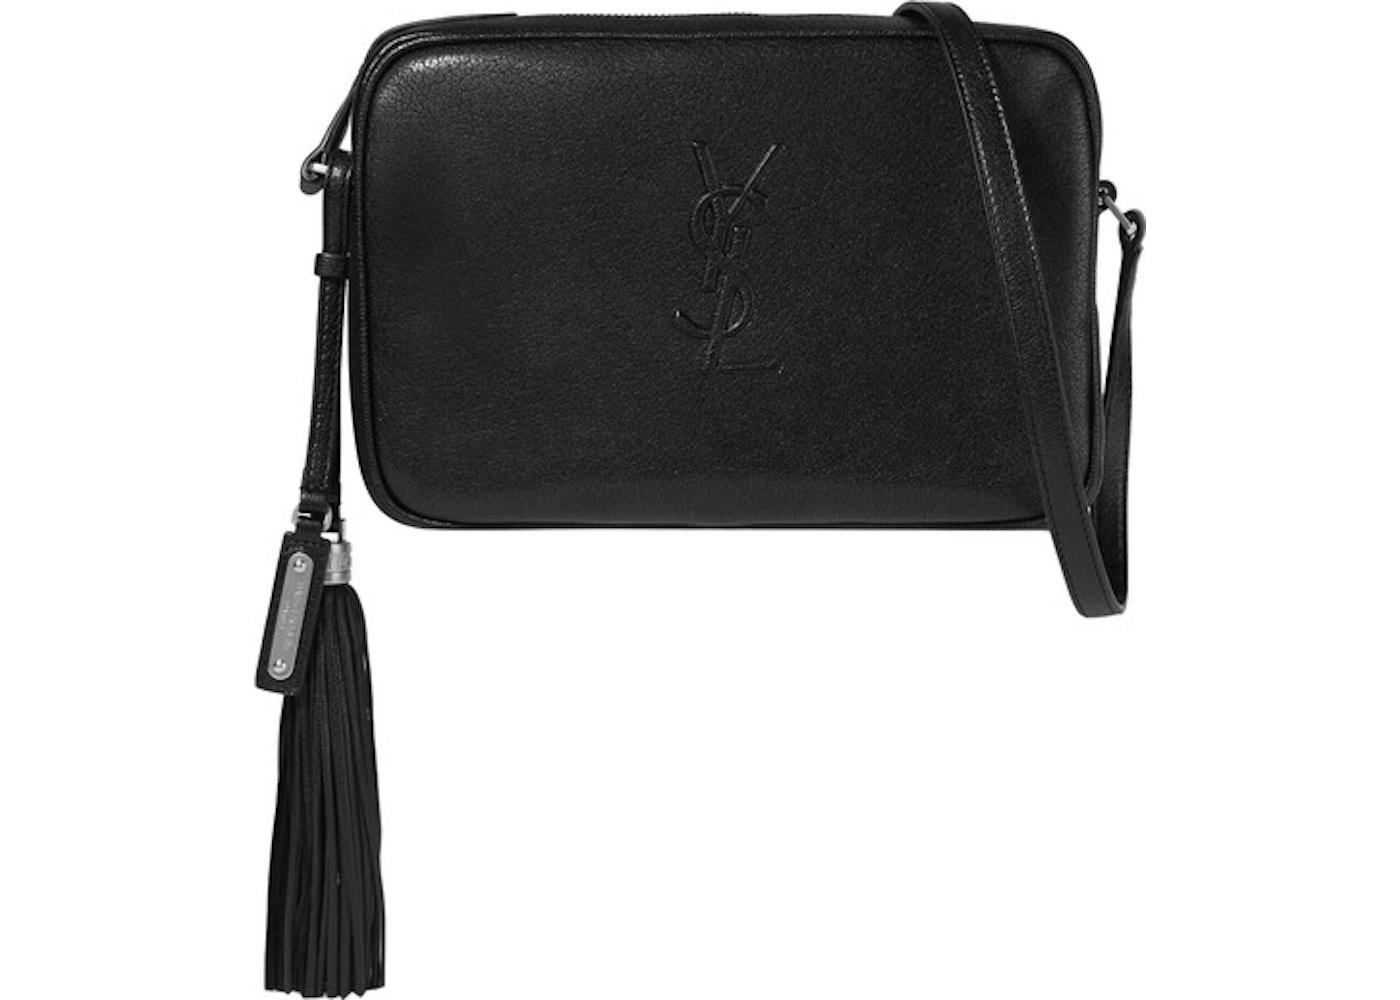 Buy   Sell Saint Laurent Lou Handbags - Highest Bid 2b0b840c14